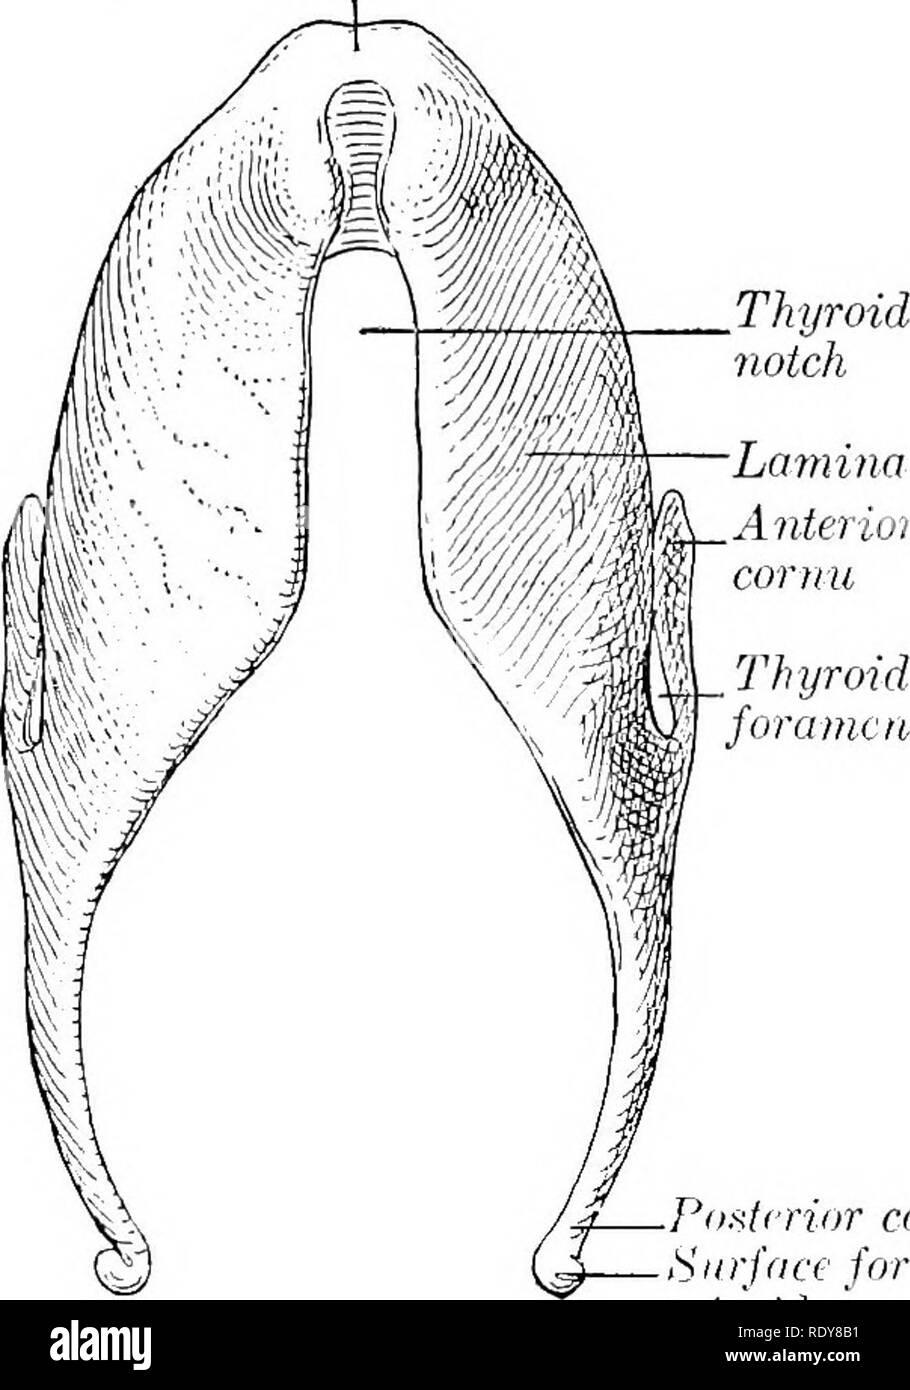 The Anatomy Of The Domestic Animals Veterinary Anatomy Thyroid